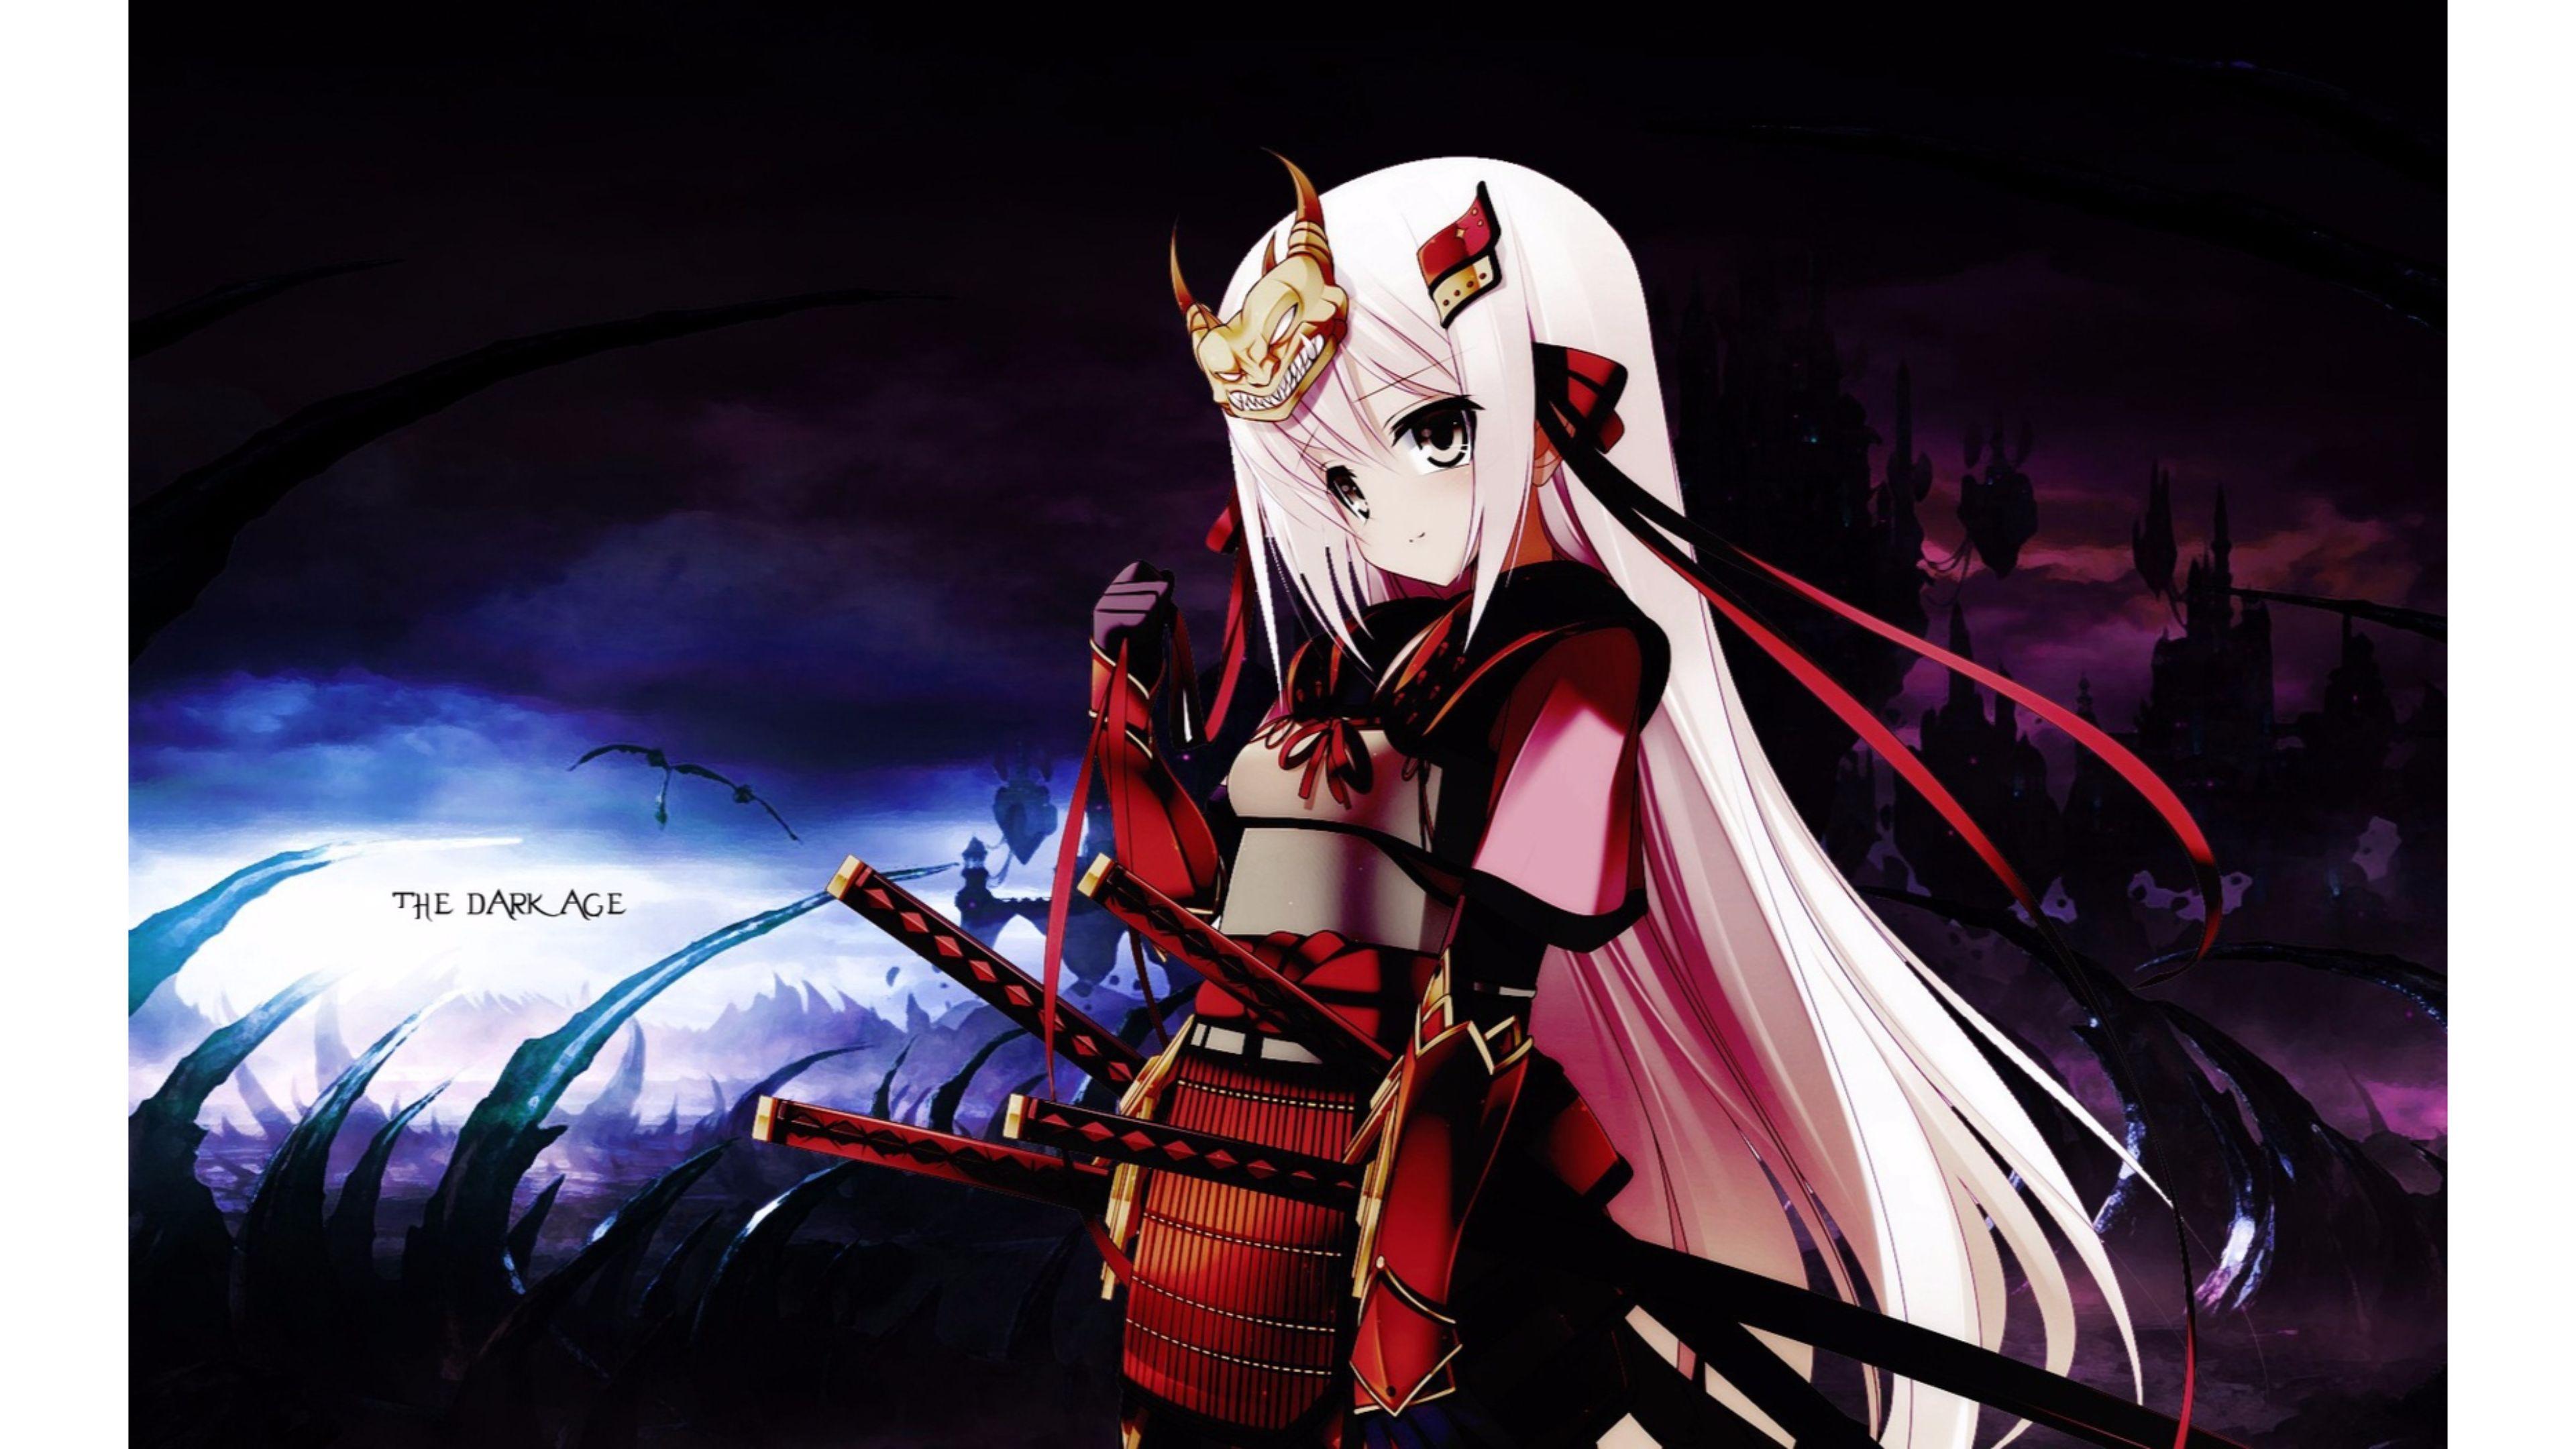 Dark Age 4K Anime Wallpapers 4K Wallpaper 3840x2160